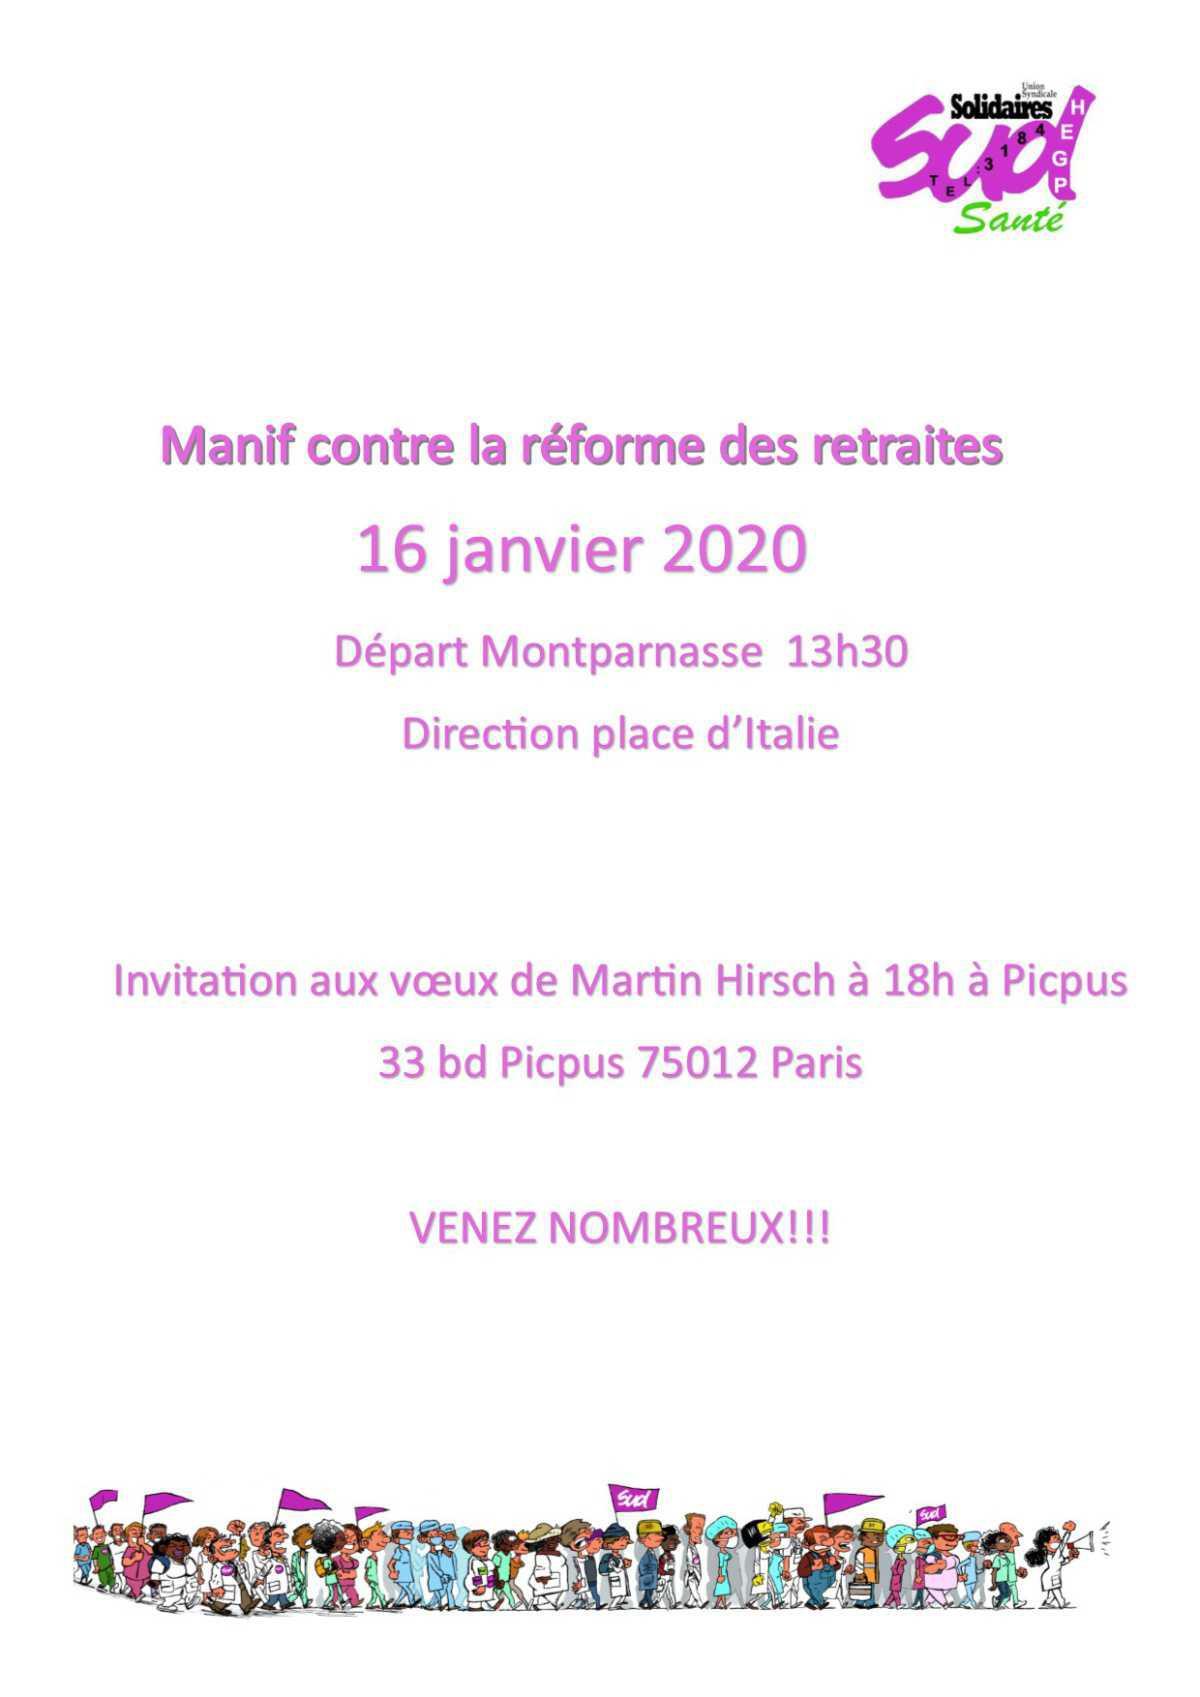 manifestation le 16 janvier 2020